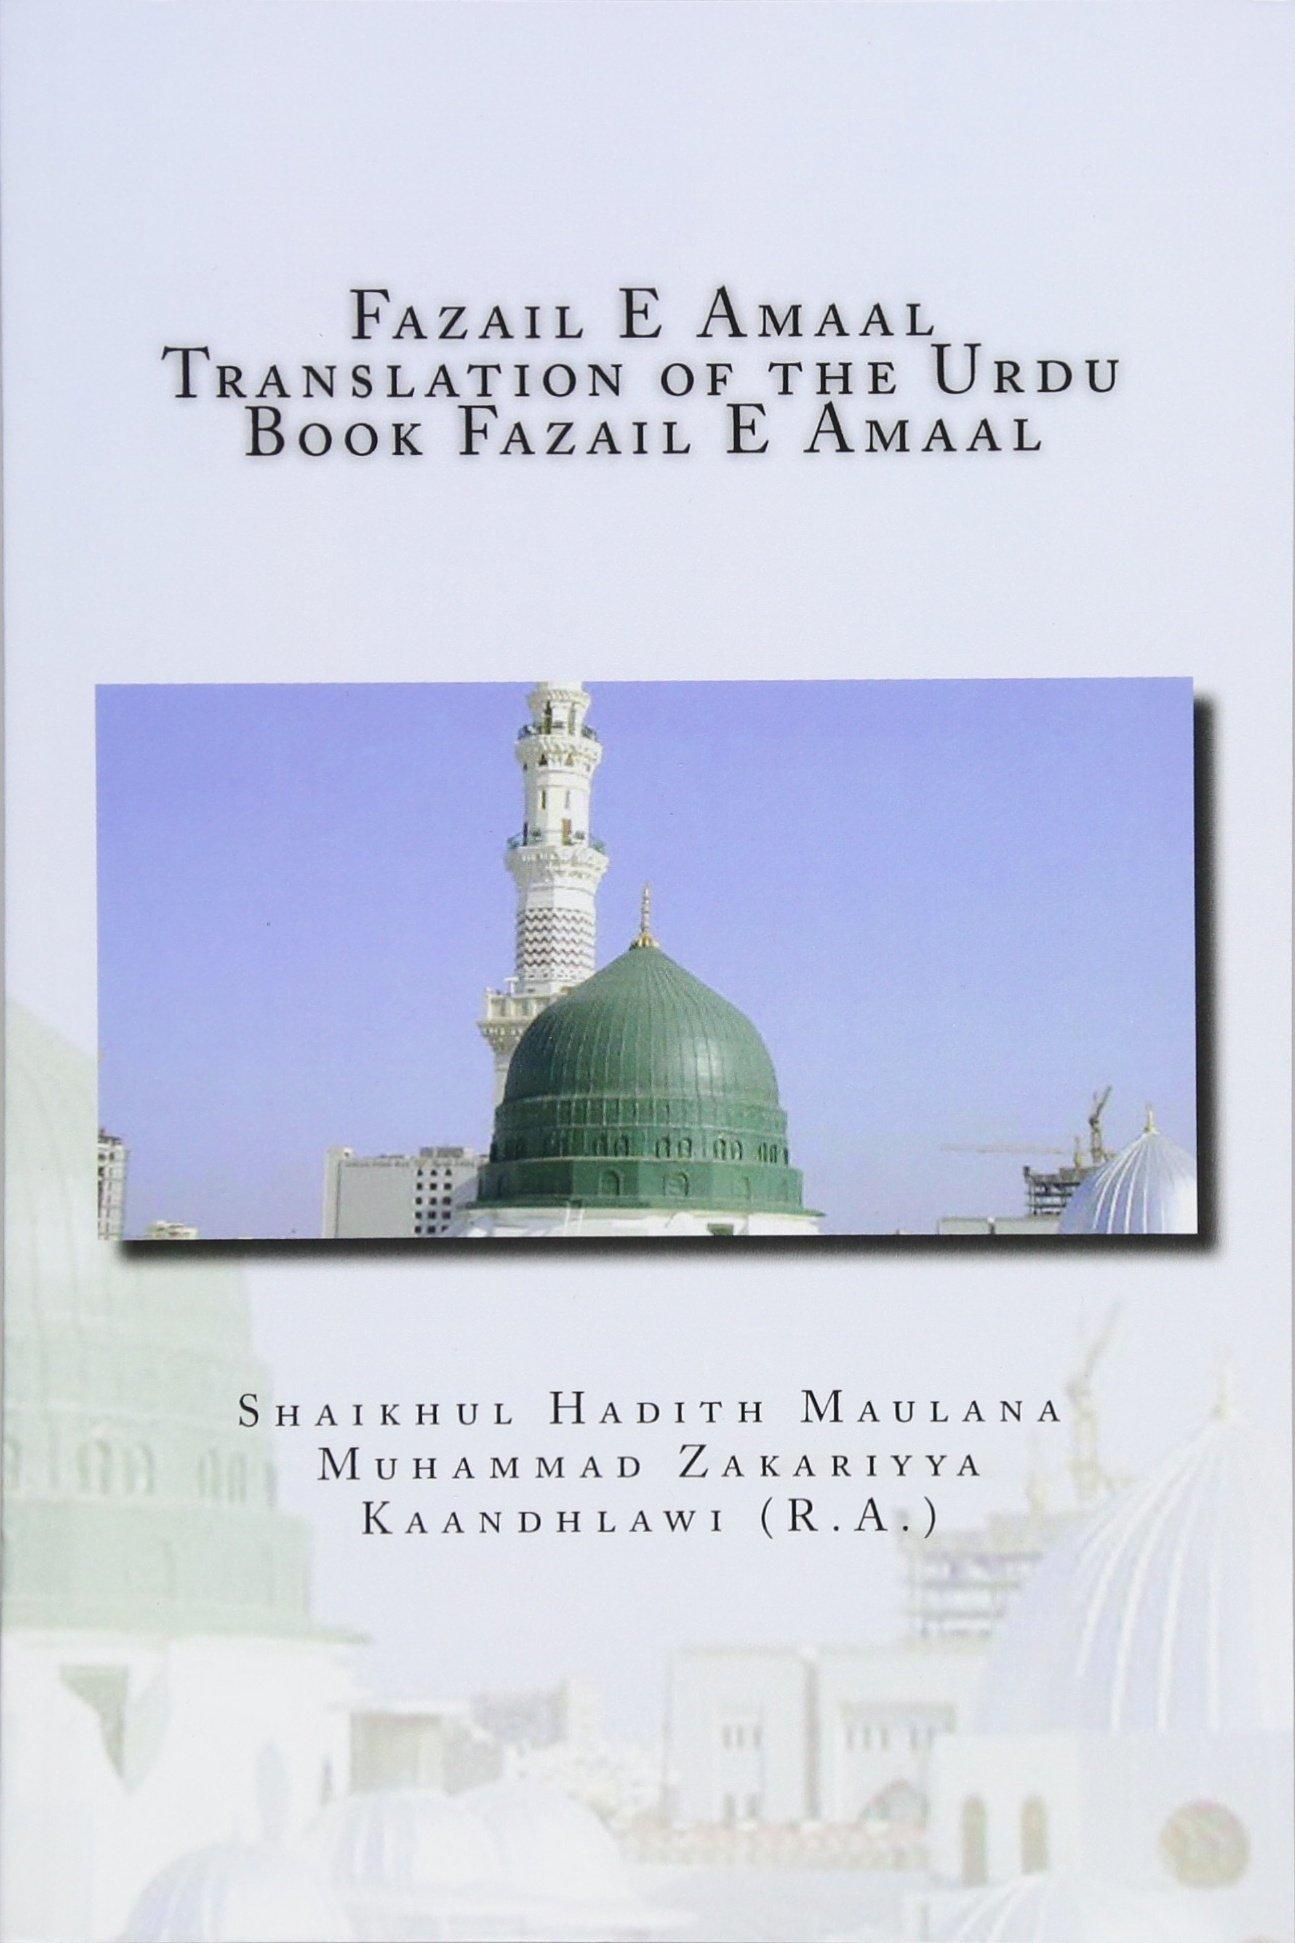 Fazail E Amaal - Translation of the Urdu Book Fazail E Amaal: All Parts in One Book PDF